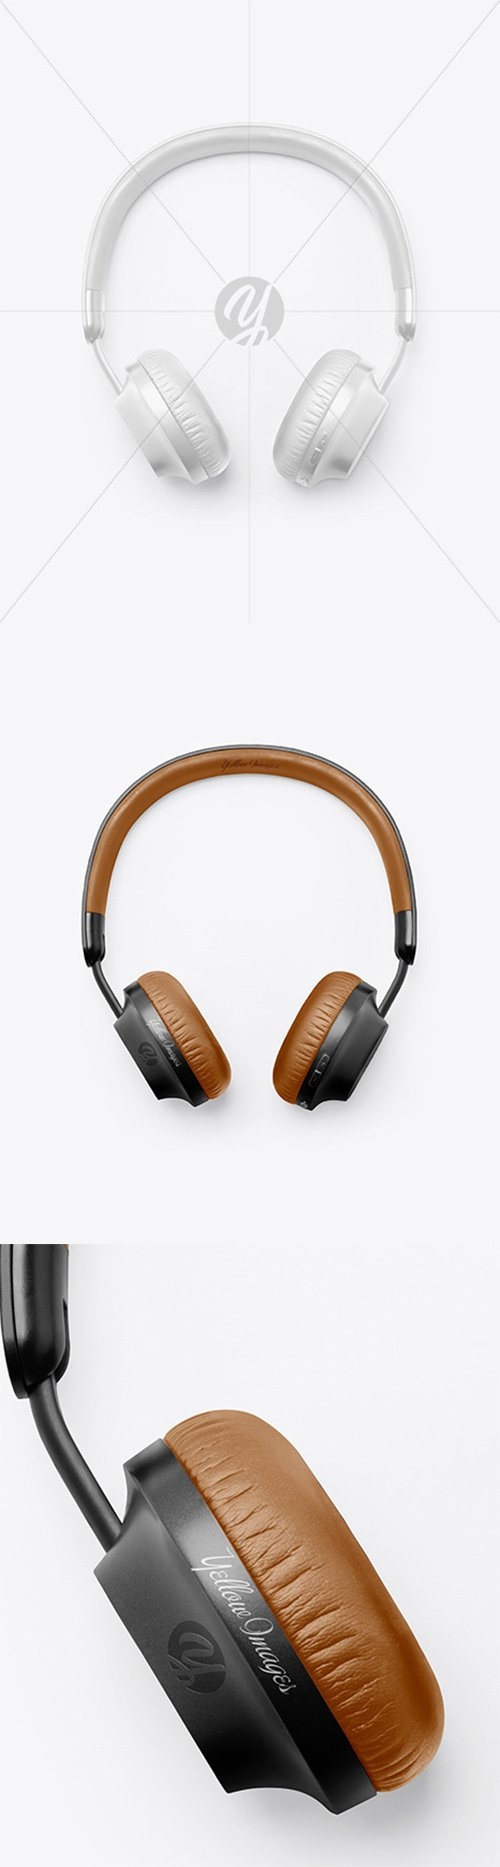 Headphones Mockup 60288 TIF